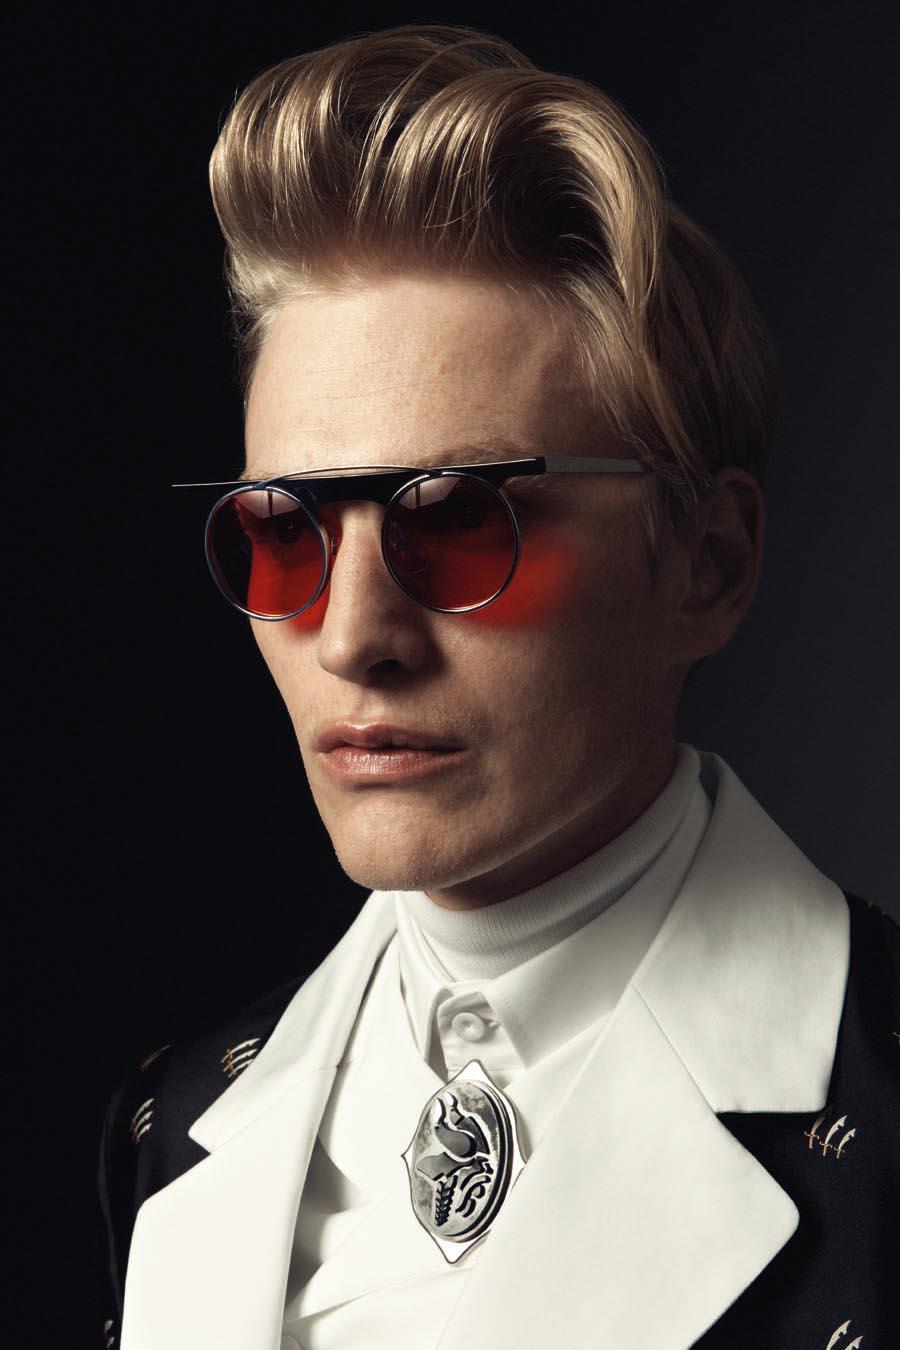 Gerhard Freidl0327_VIKTOR Magazine_Ph Adriano Russo(Wiener Models)